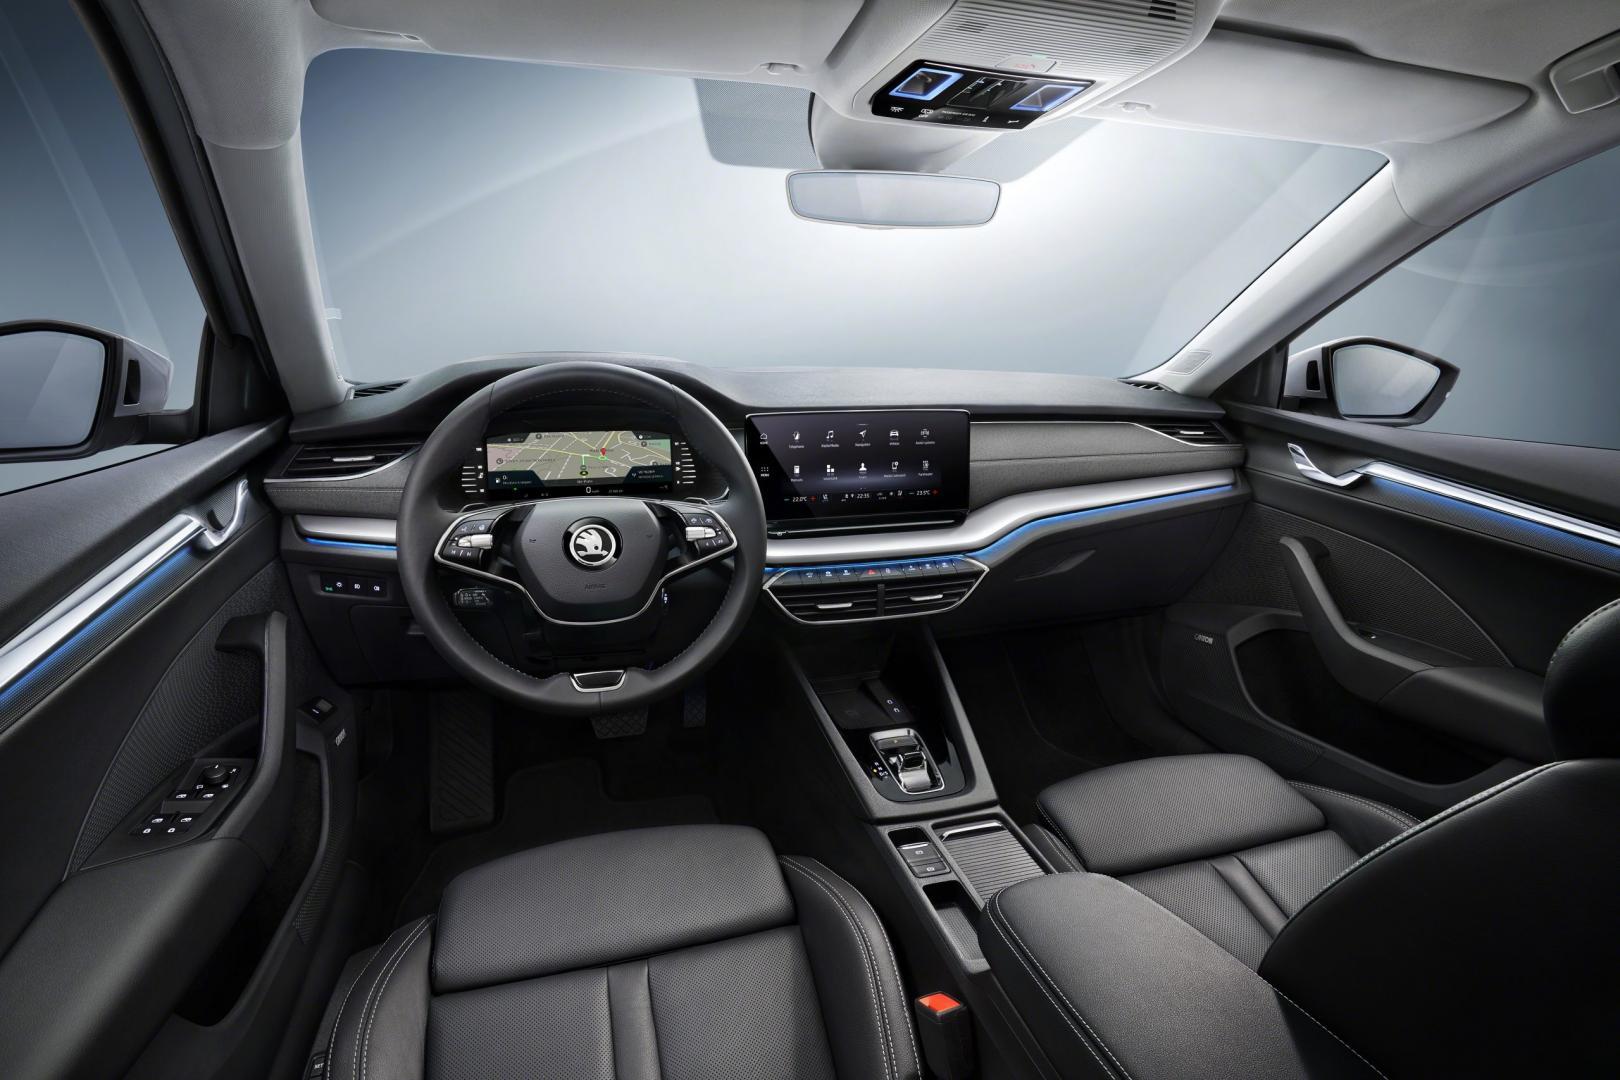 Nieuwe Skoda Octavia 2020 dashboard interieur